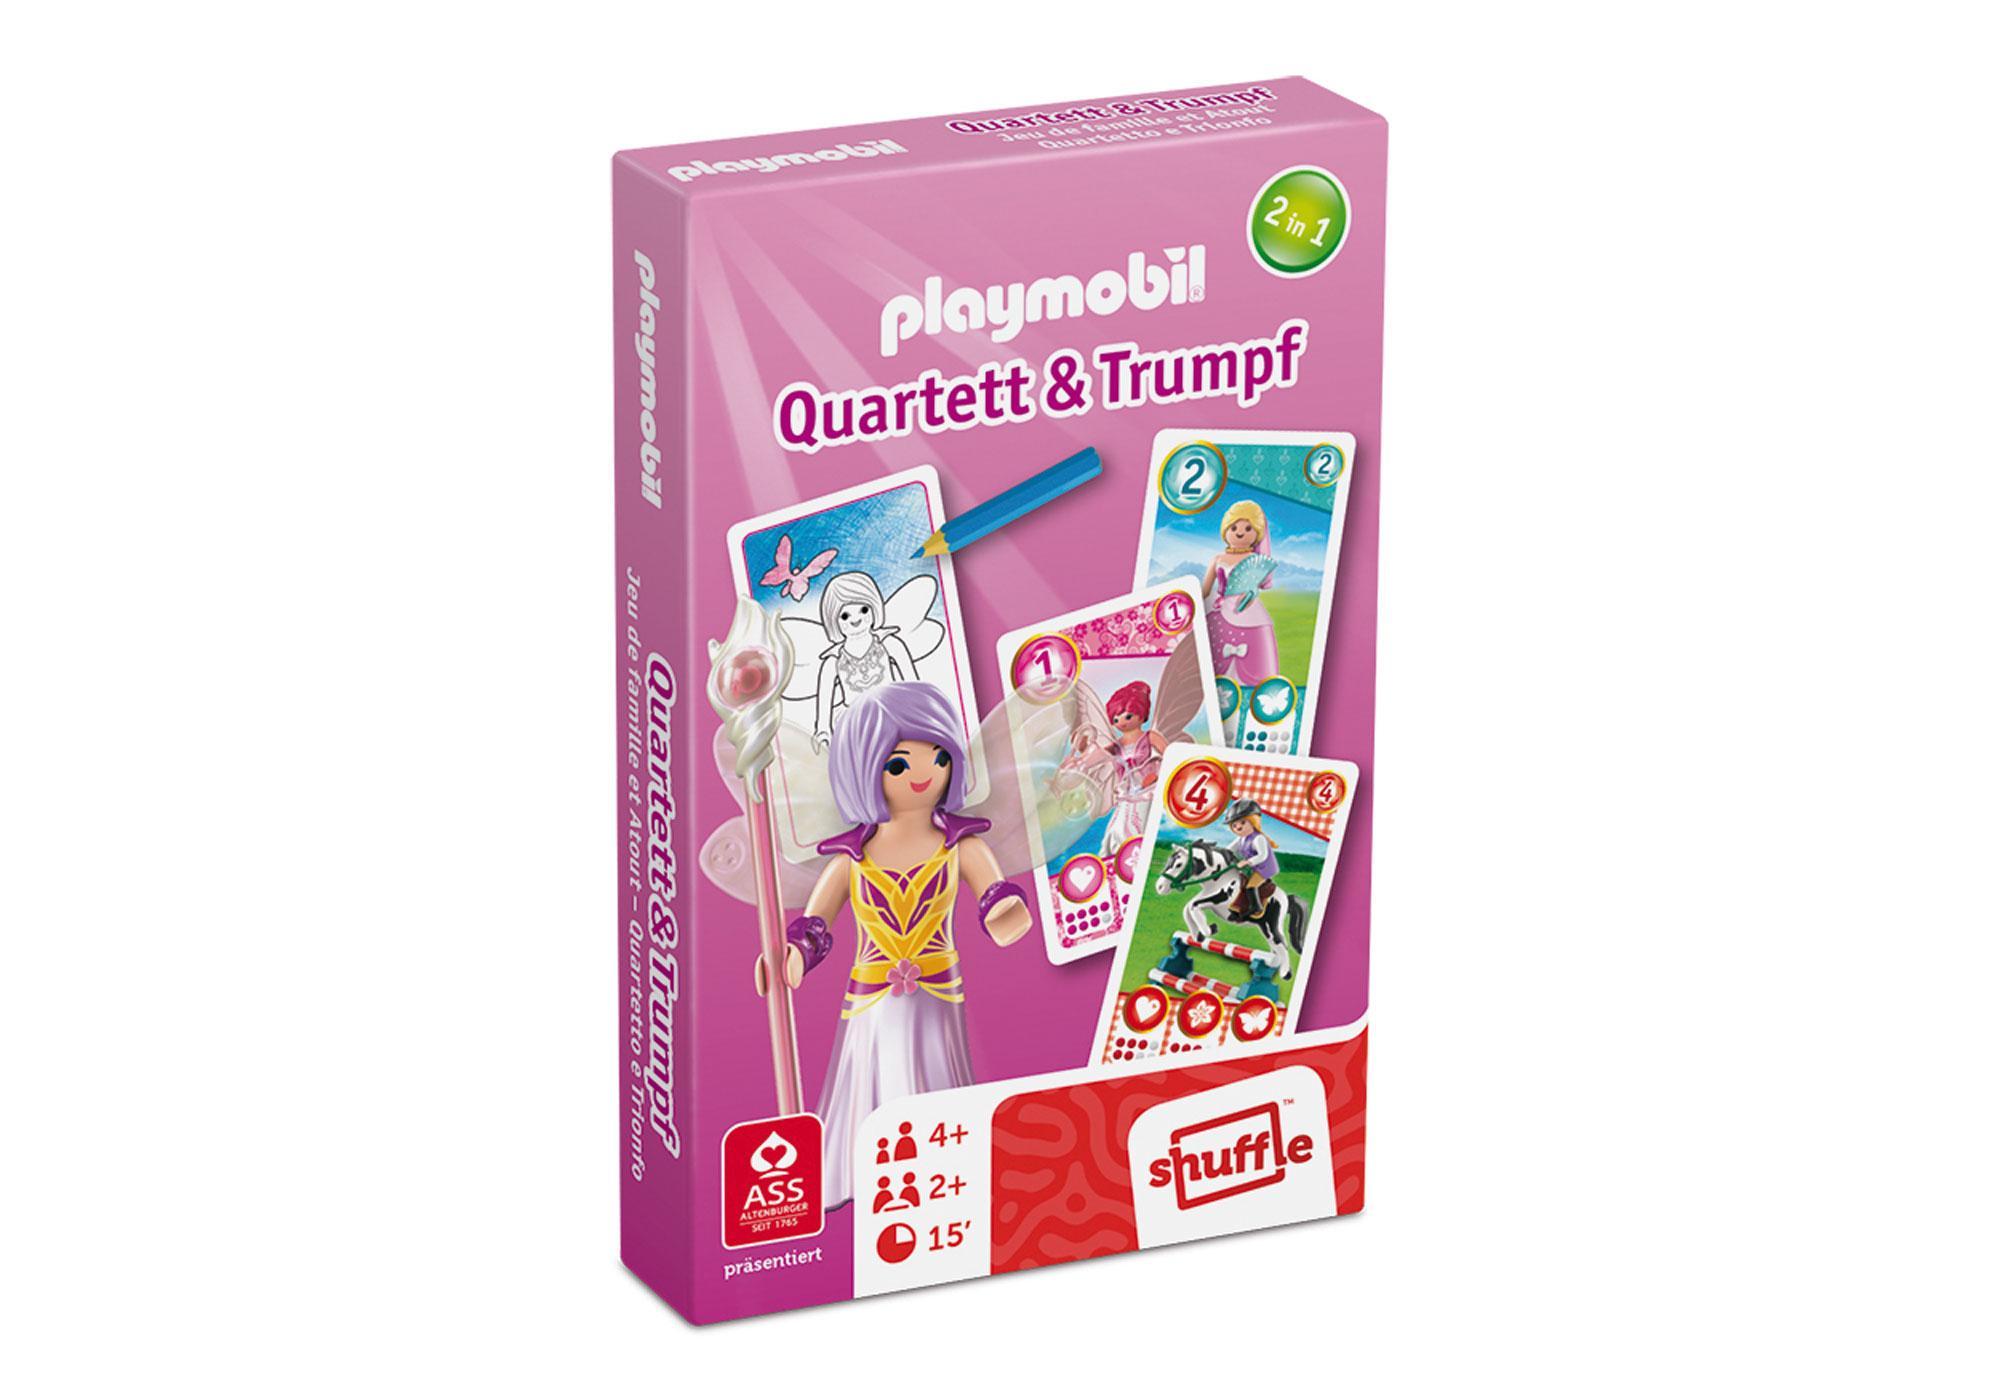 http://media.playmobil.com/i/playmobil/80094_product_detail